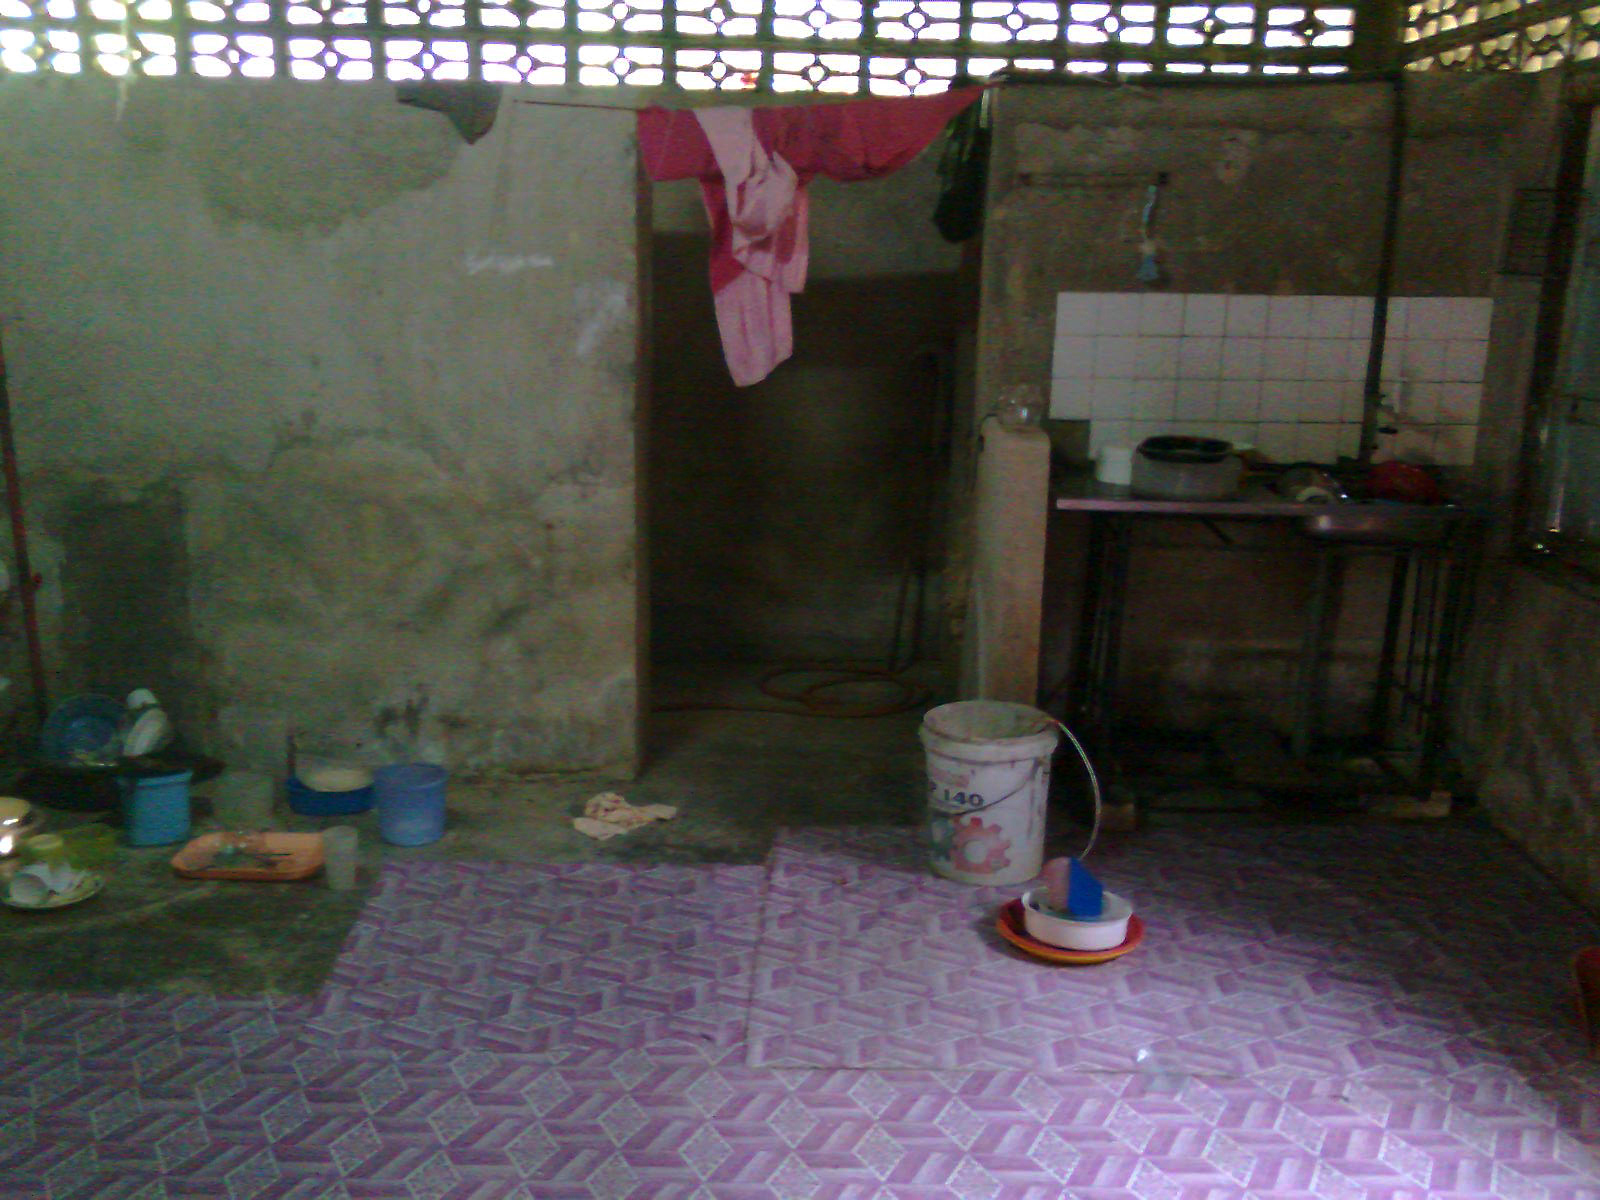 Ha Inilah Dapur Dan Tandas Rumah Ni Sangat Simple Buruk Kan Menjadikan Disebabkan Mak Saudara Aku Tak Pandai Kemas Jaga Tapi Kalau